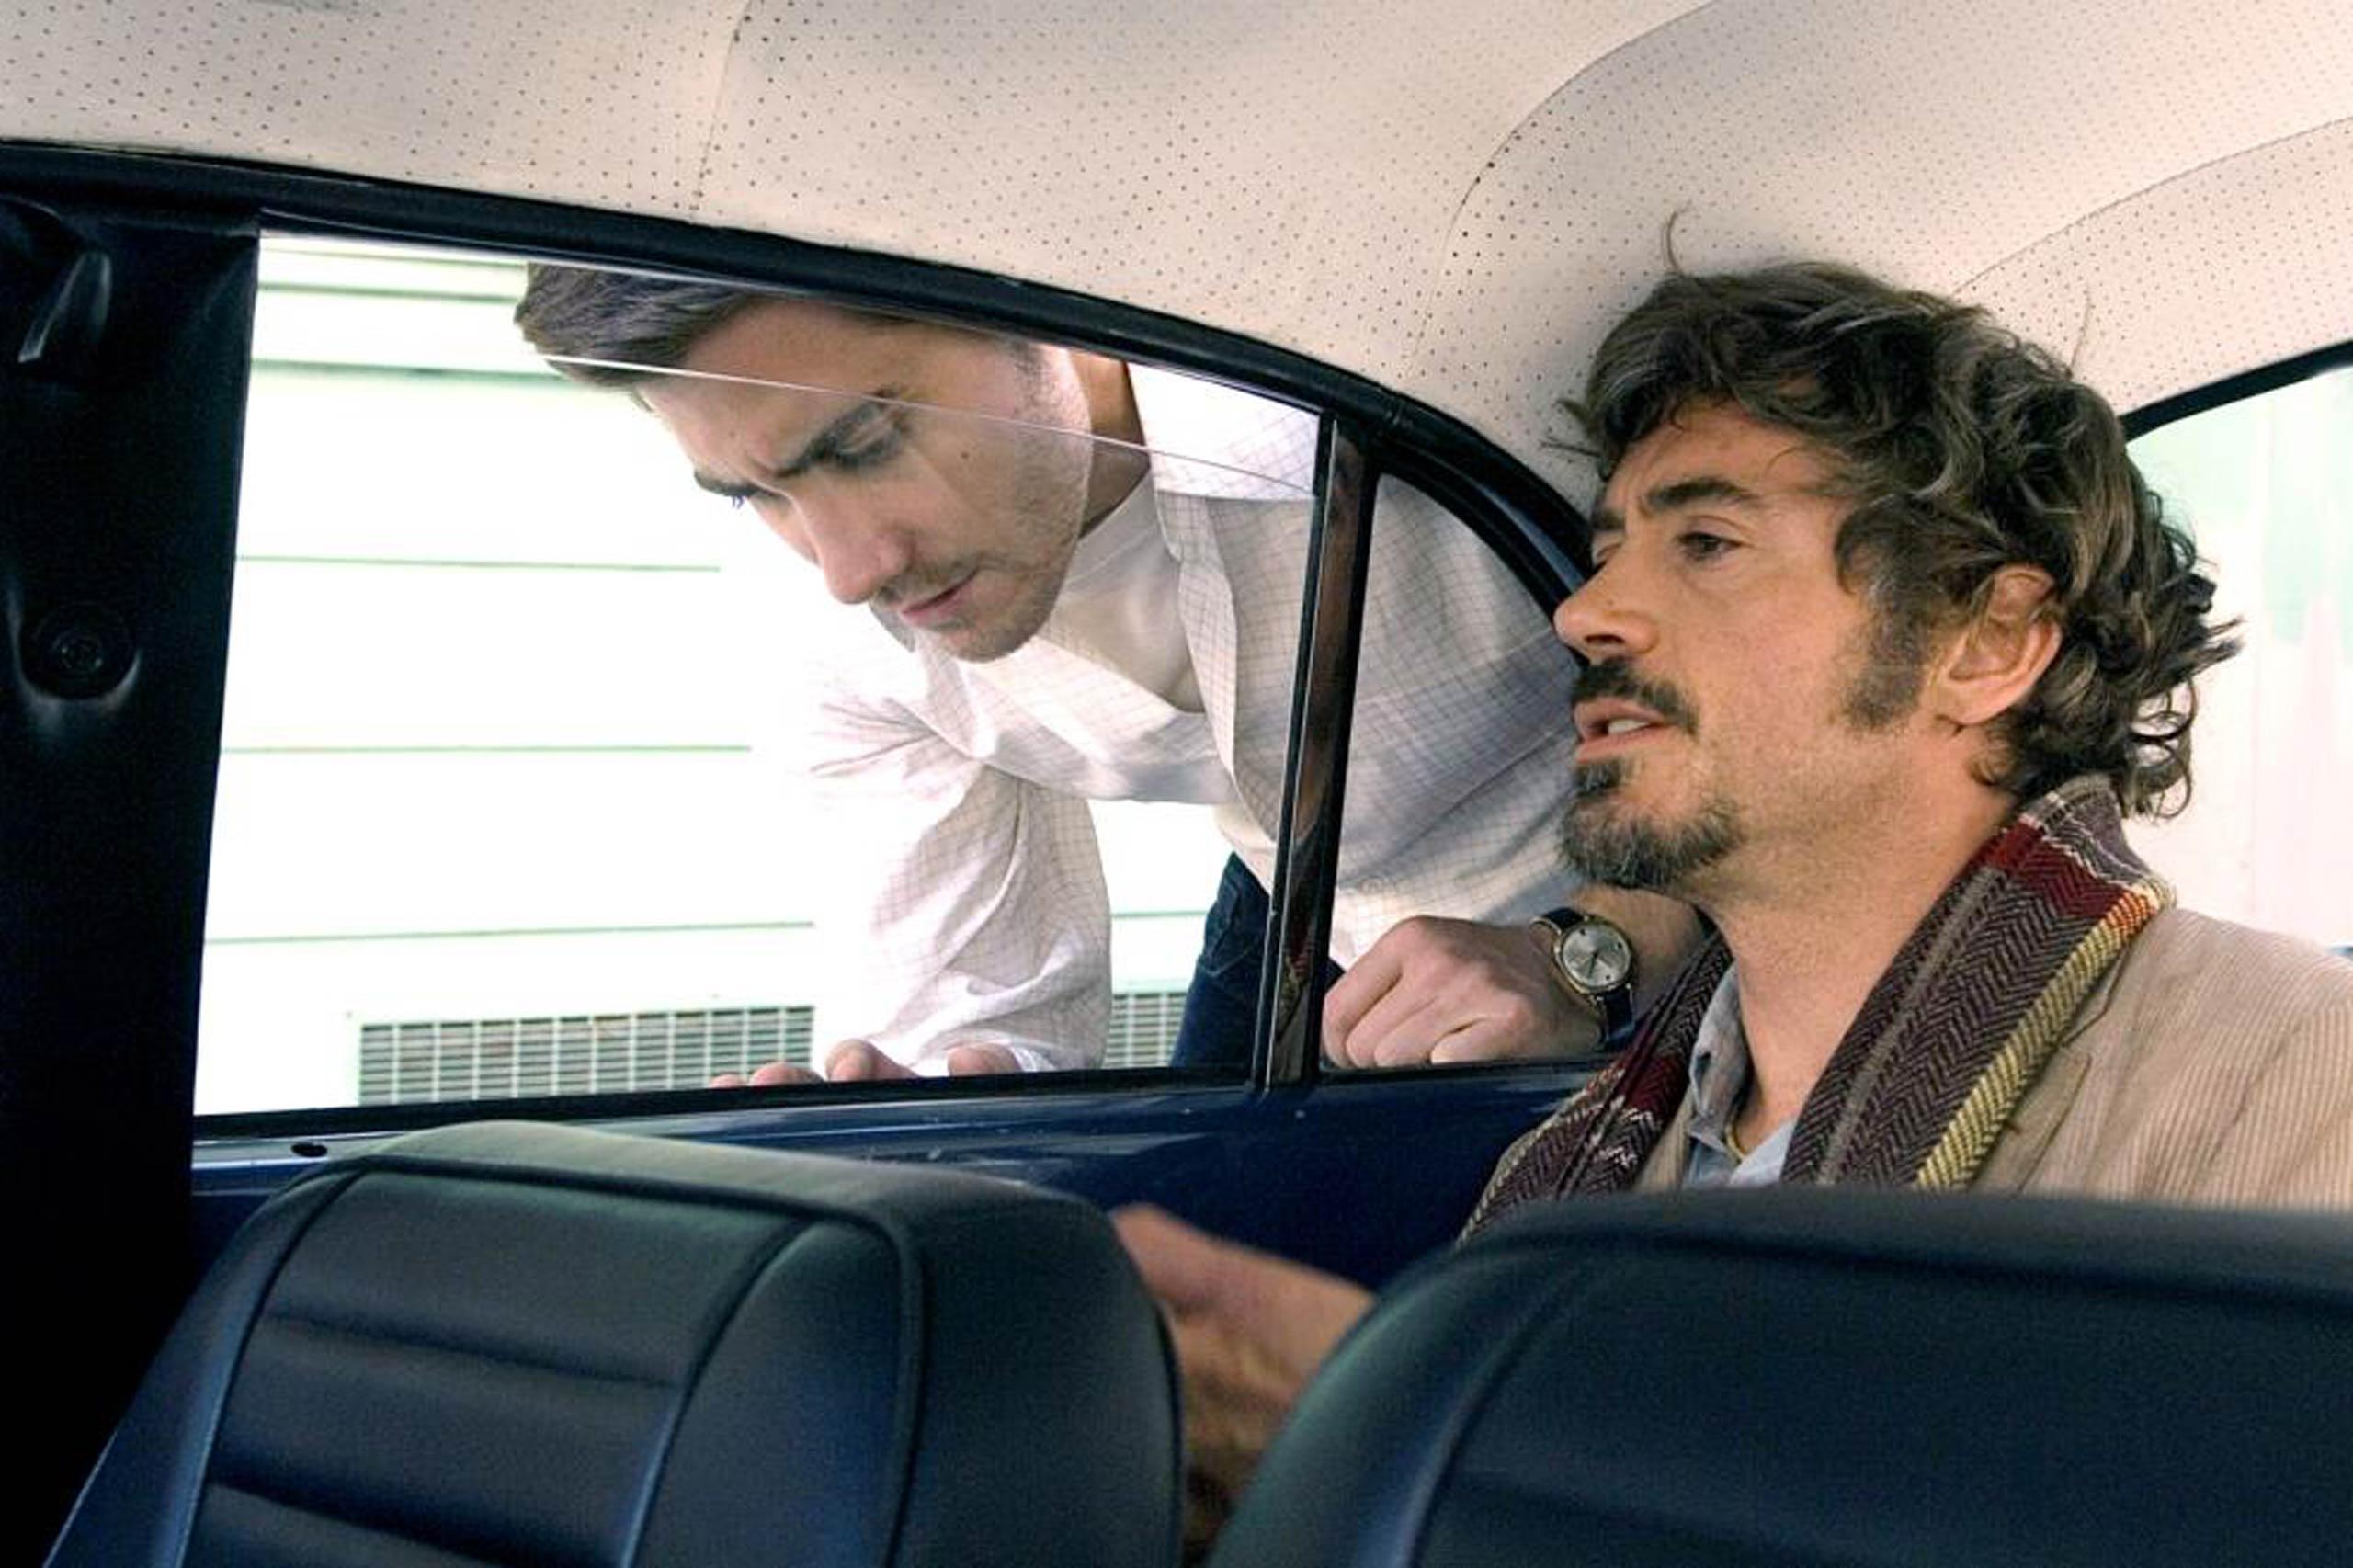 Jake Gyllenhaal and Robert Downey Jr. in <i>Zodiac</i>, 2007.